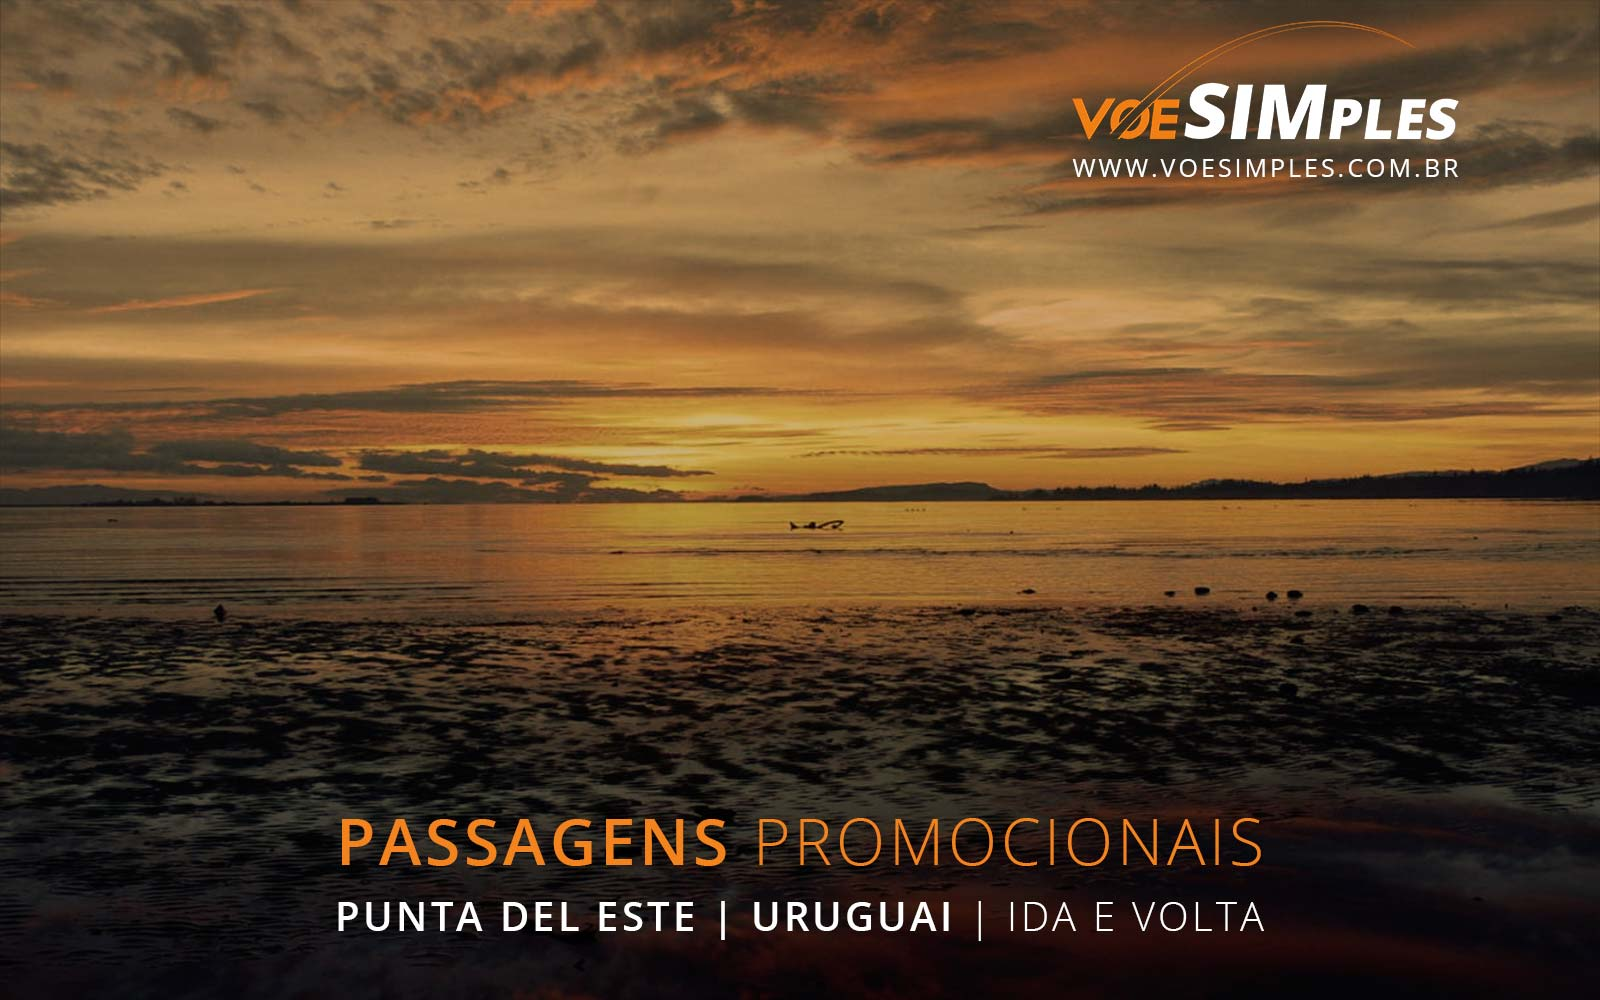 Passagens aéreas promocionais para Punta del Este no Uruguai